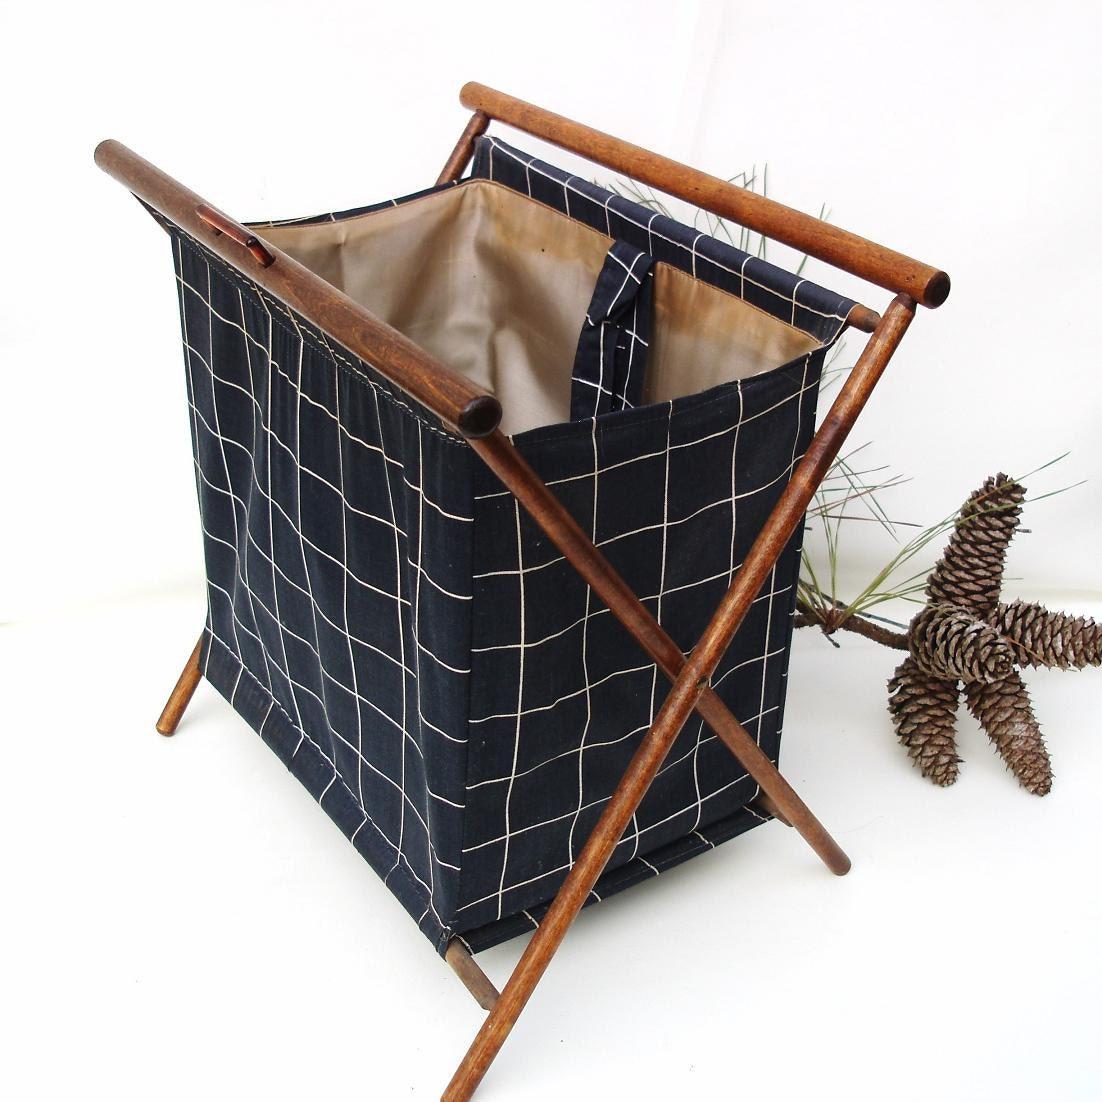 Vintage Folding Knitting Basket : Vintage folding sewing basket knitting project bag by